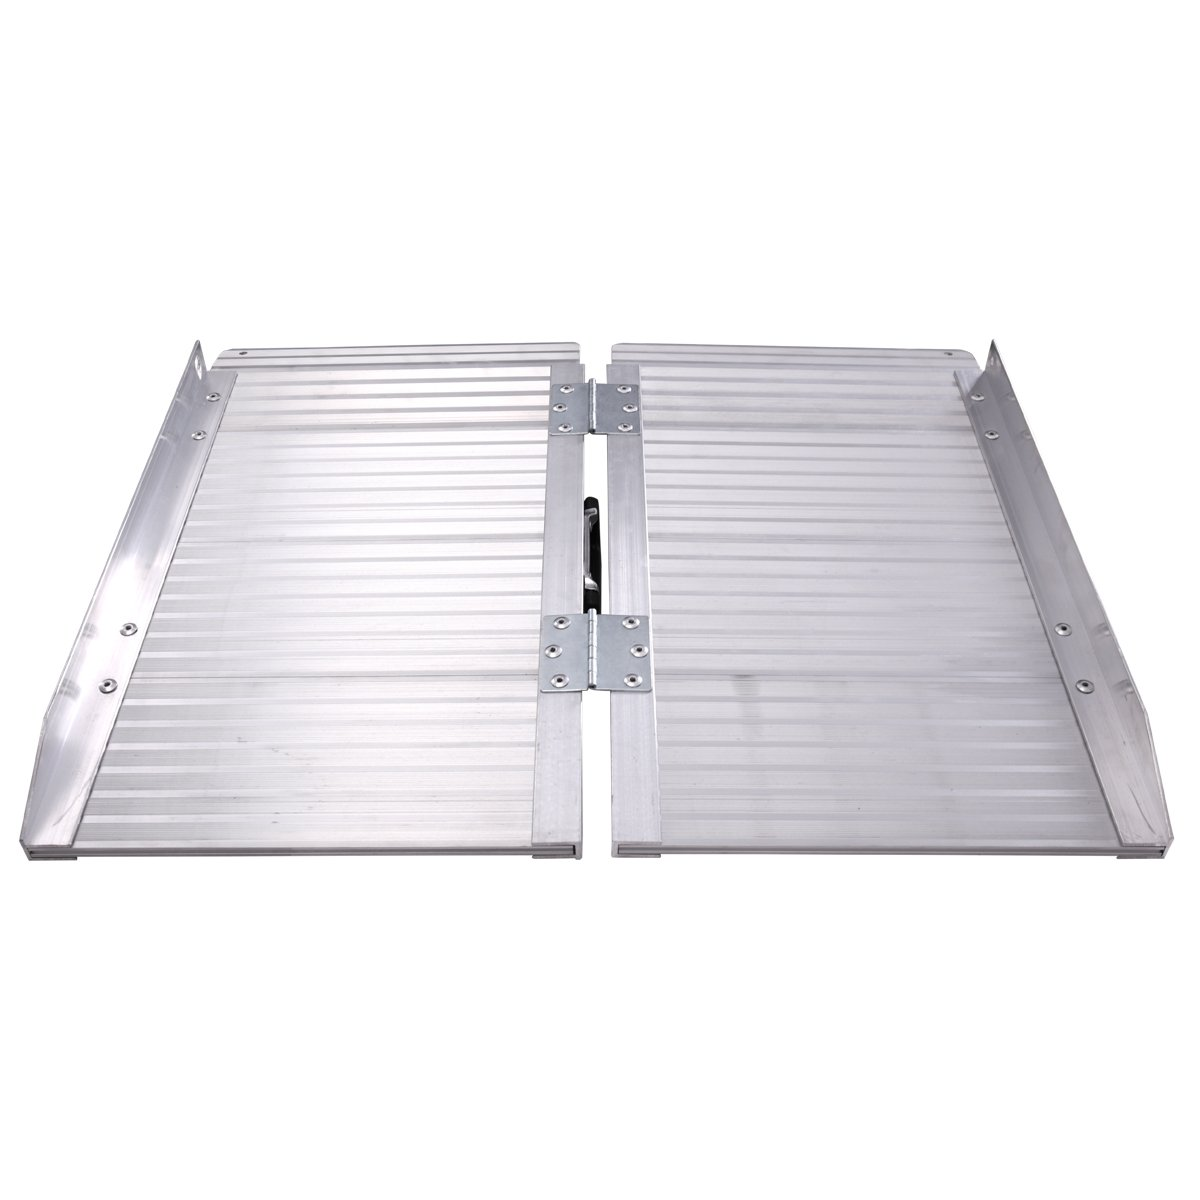 2' Aluminum Fold Portable Wheelchair Ramp Mobility Handicap Suitcase Threshold w/Handle by thegreatshopman